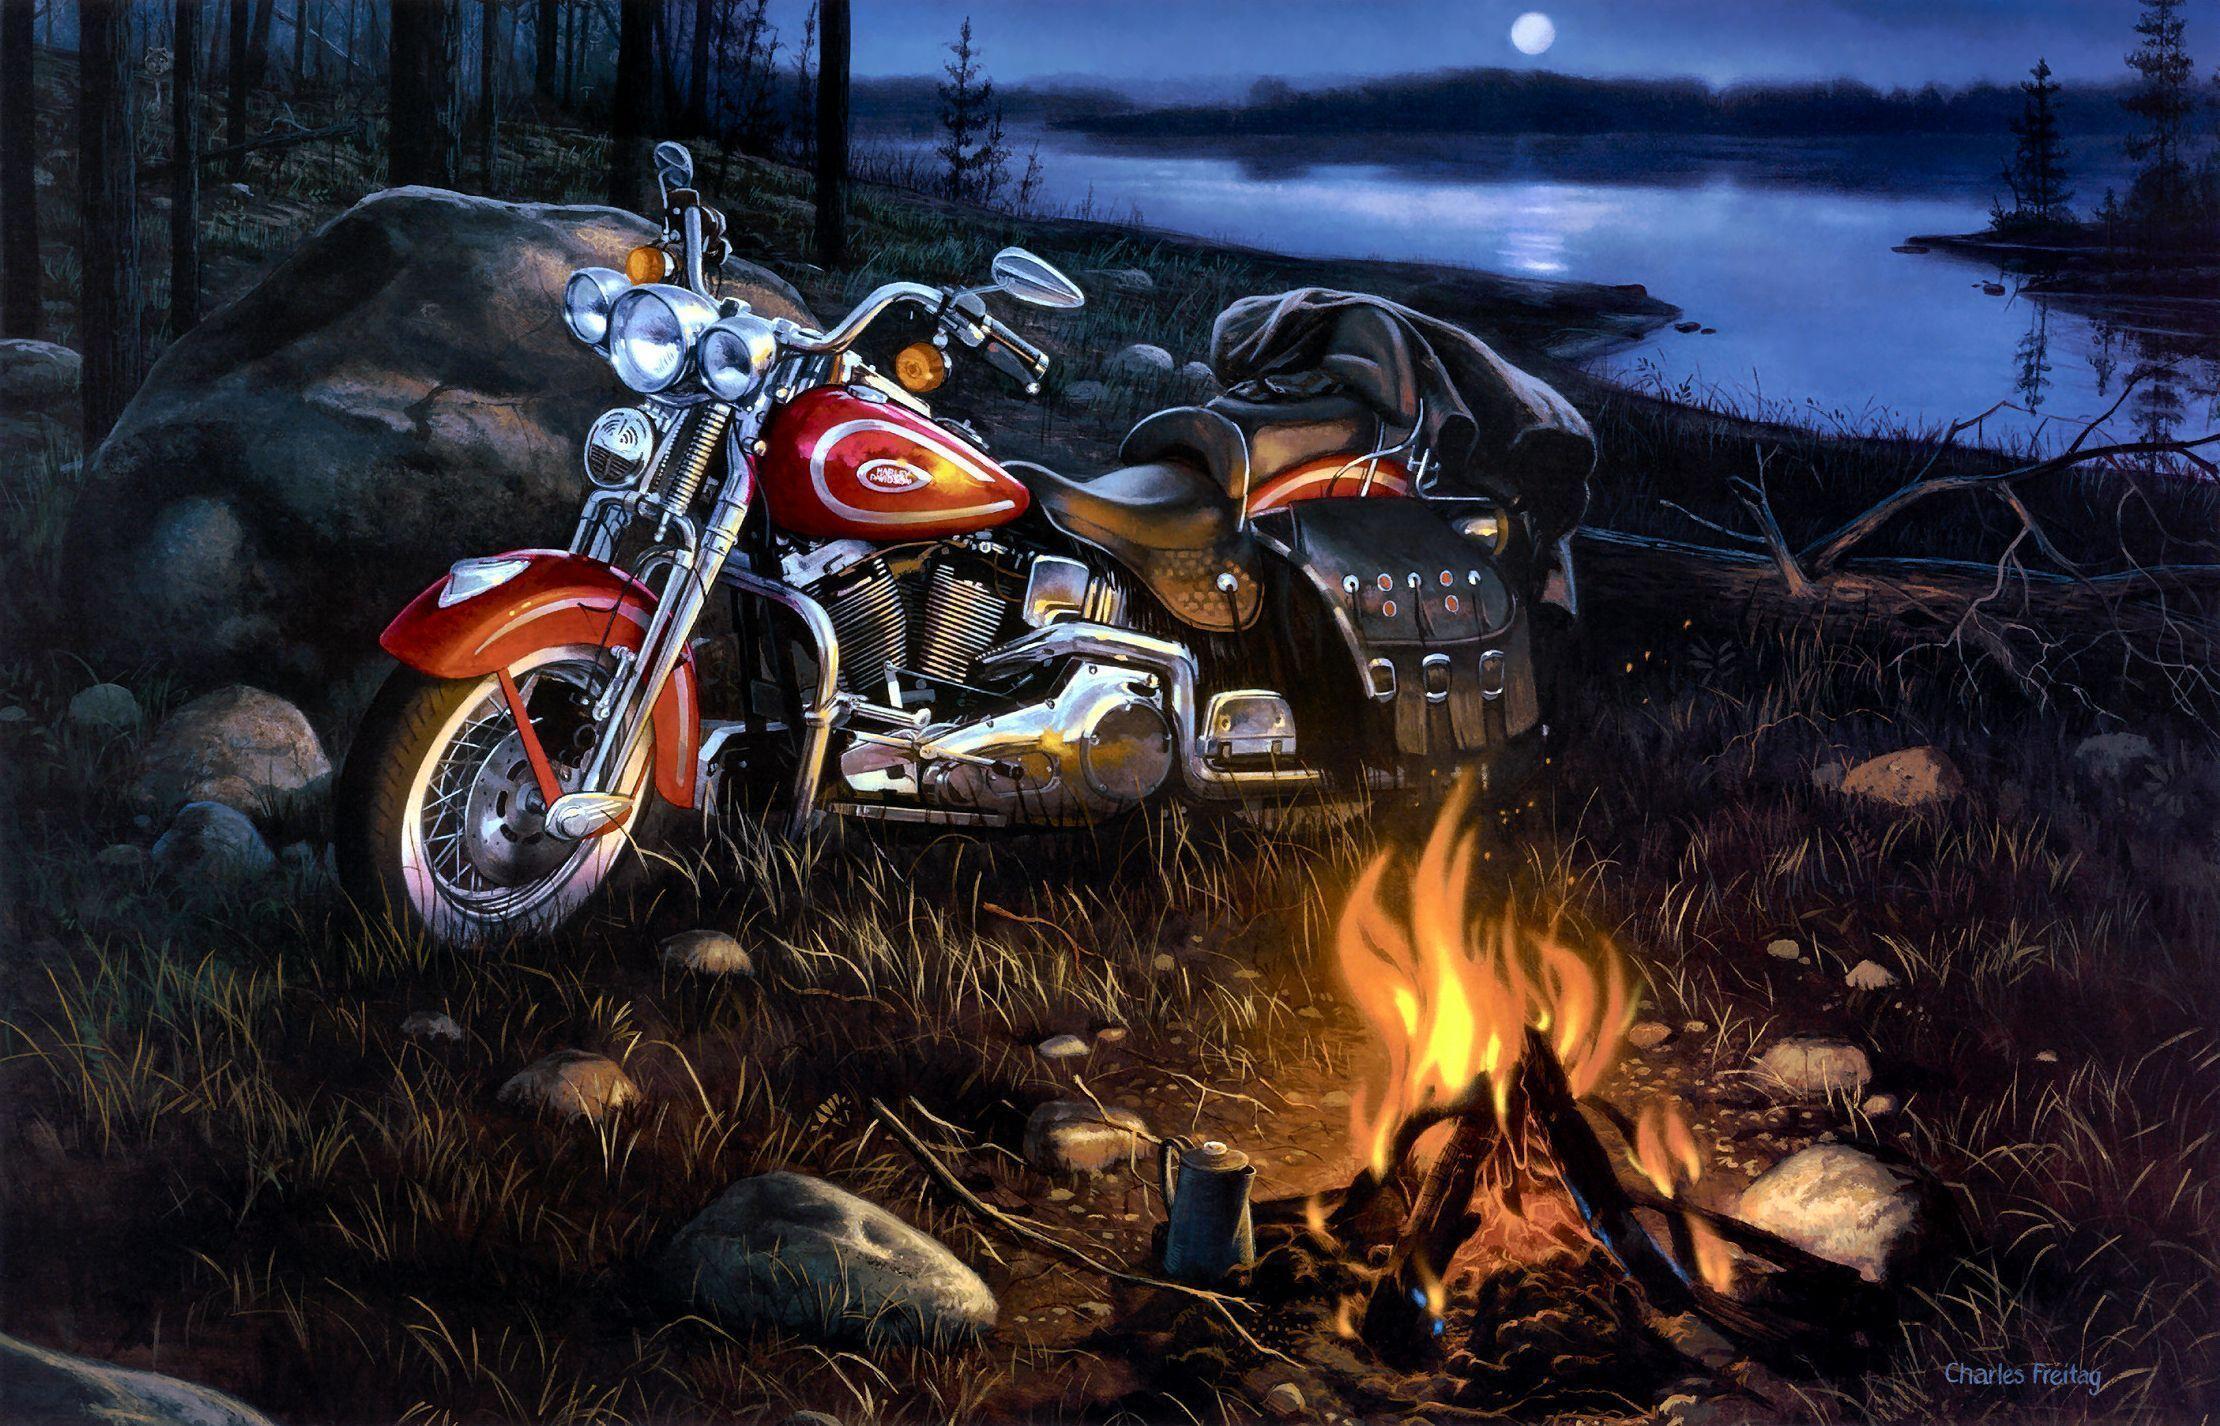 Harley Davidson Wallpapers 2220x1426